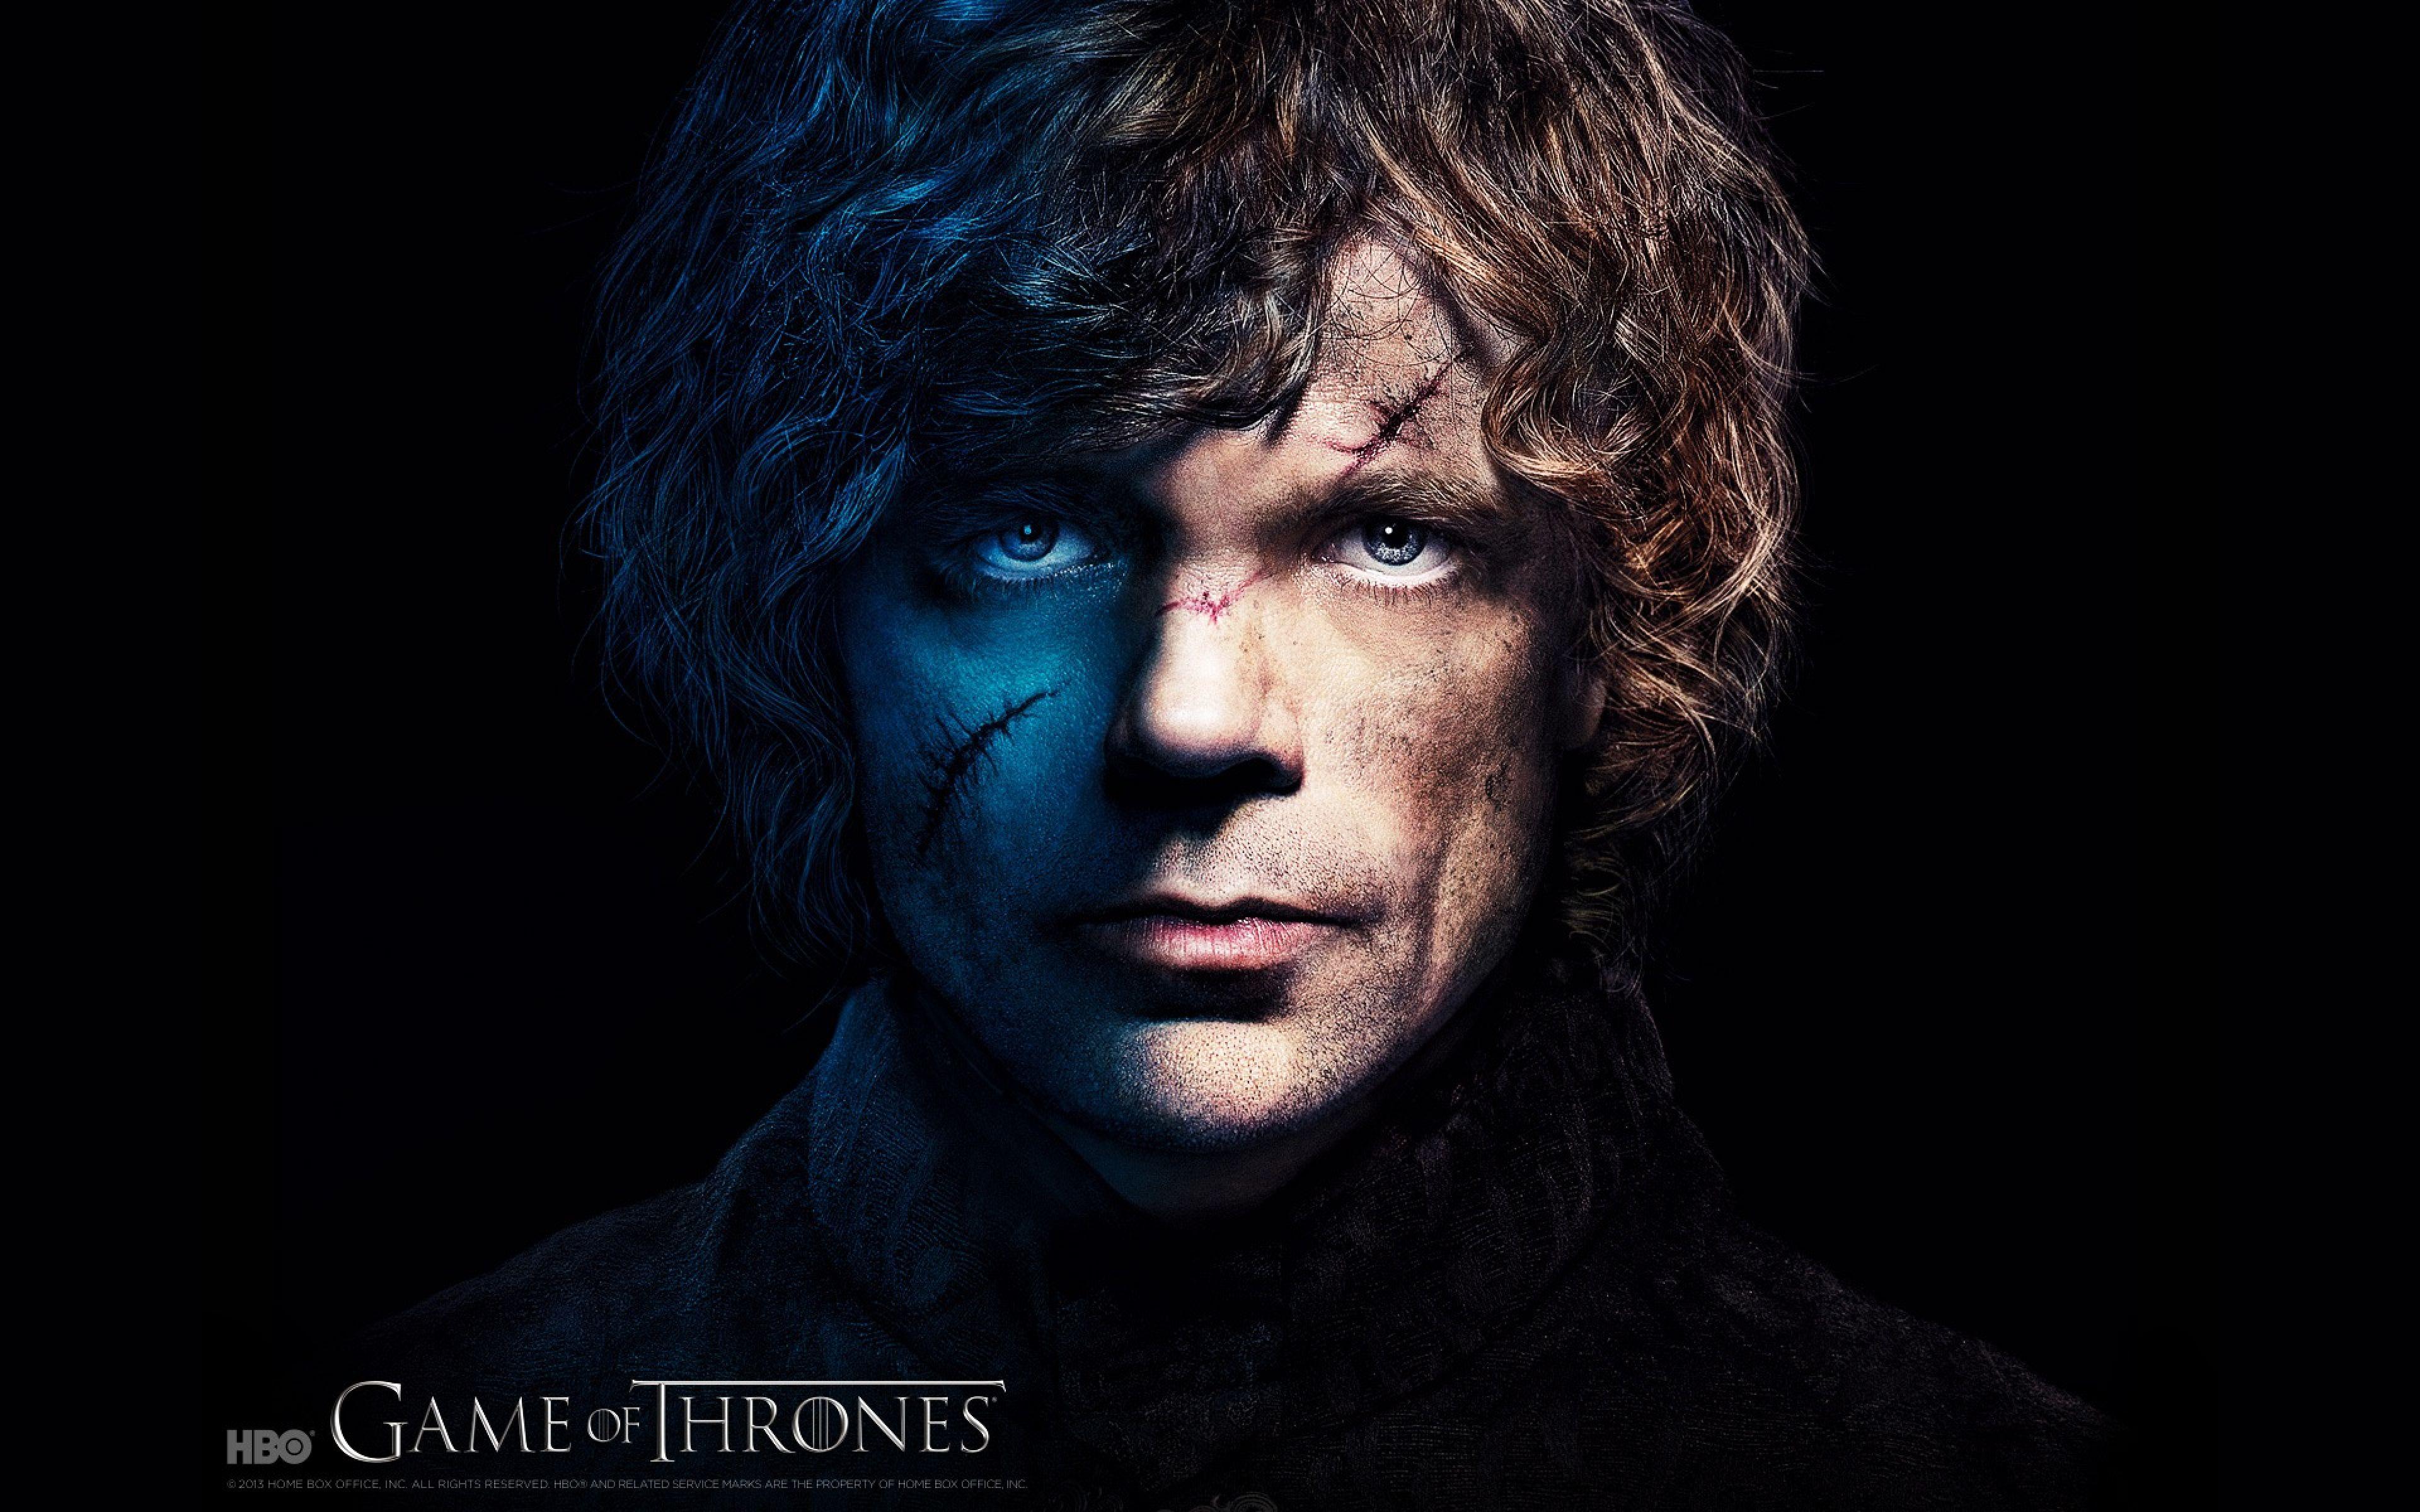 3840x2400 Wallpaper Game Of Thrones Peter Dinklage Tyrion Lannister Tyrion Game Of Thrones Tyrion Tyrion Lannister